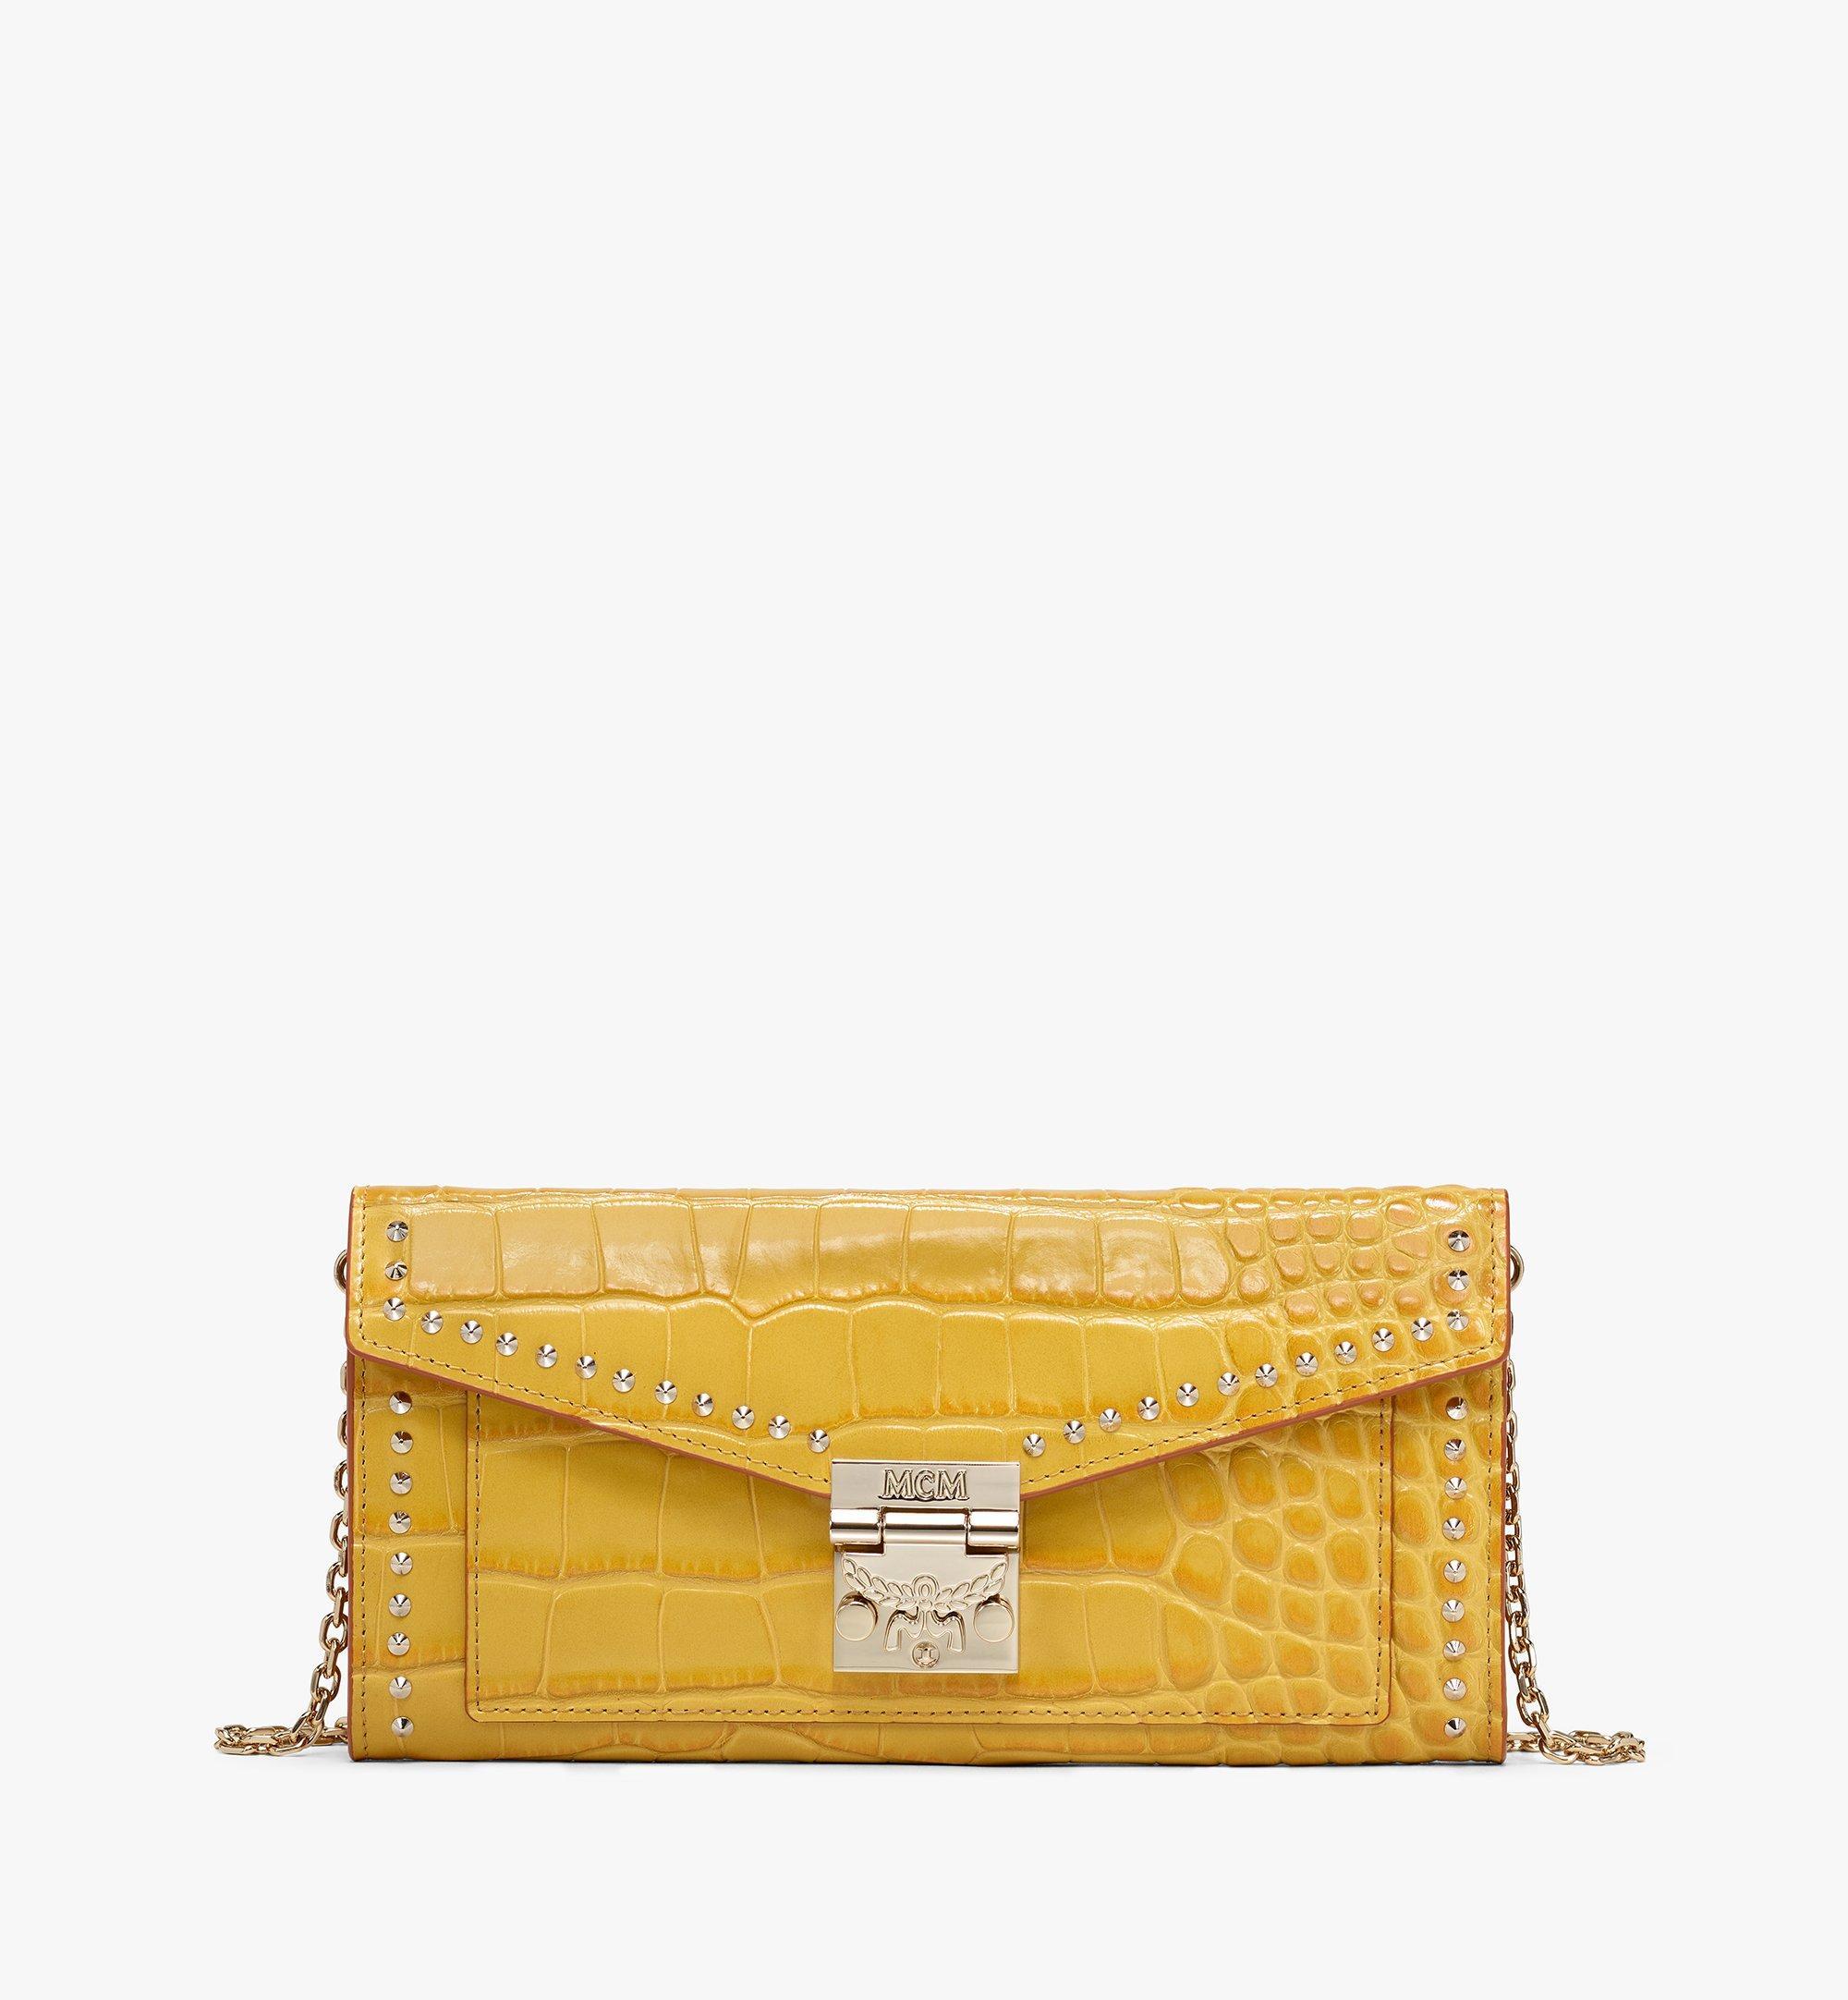 Patricia Crossbody Wallet In Embossed Crocodile in Golden Mango